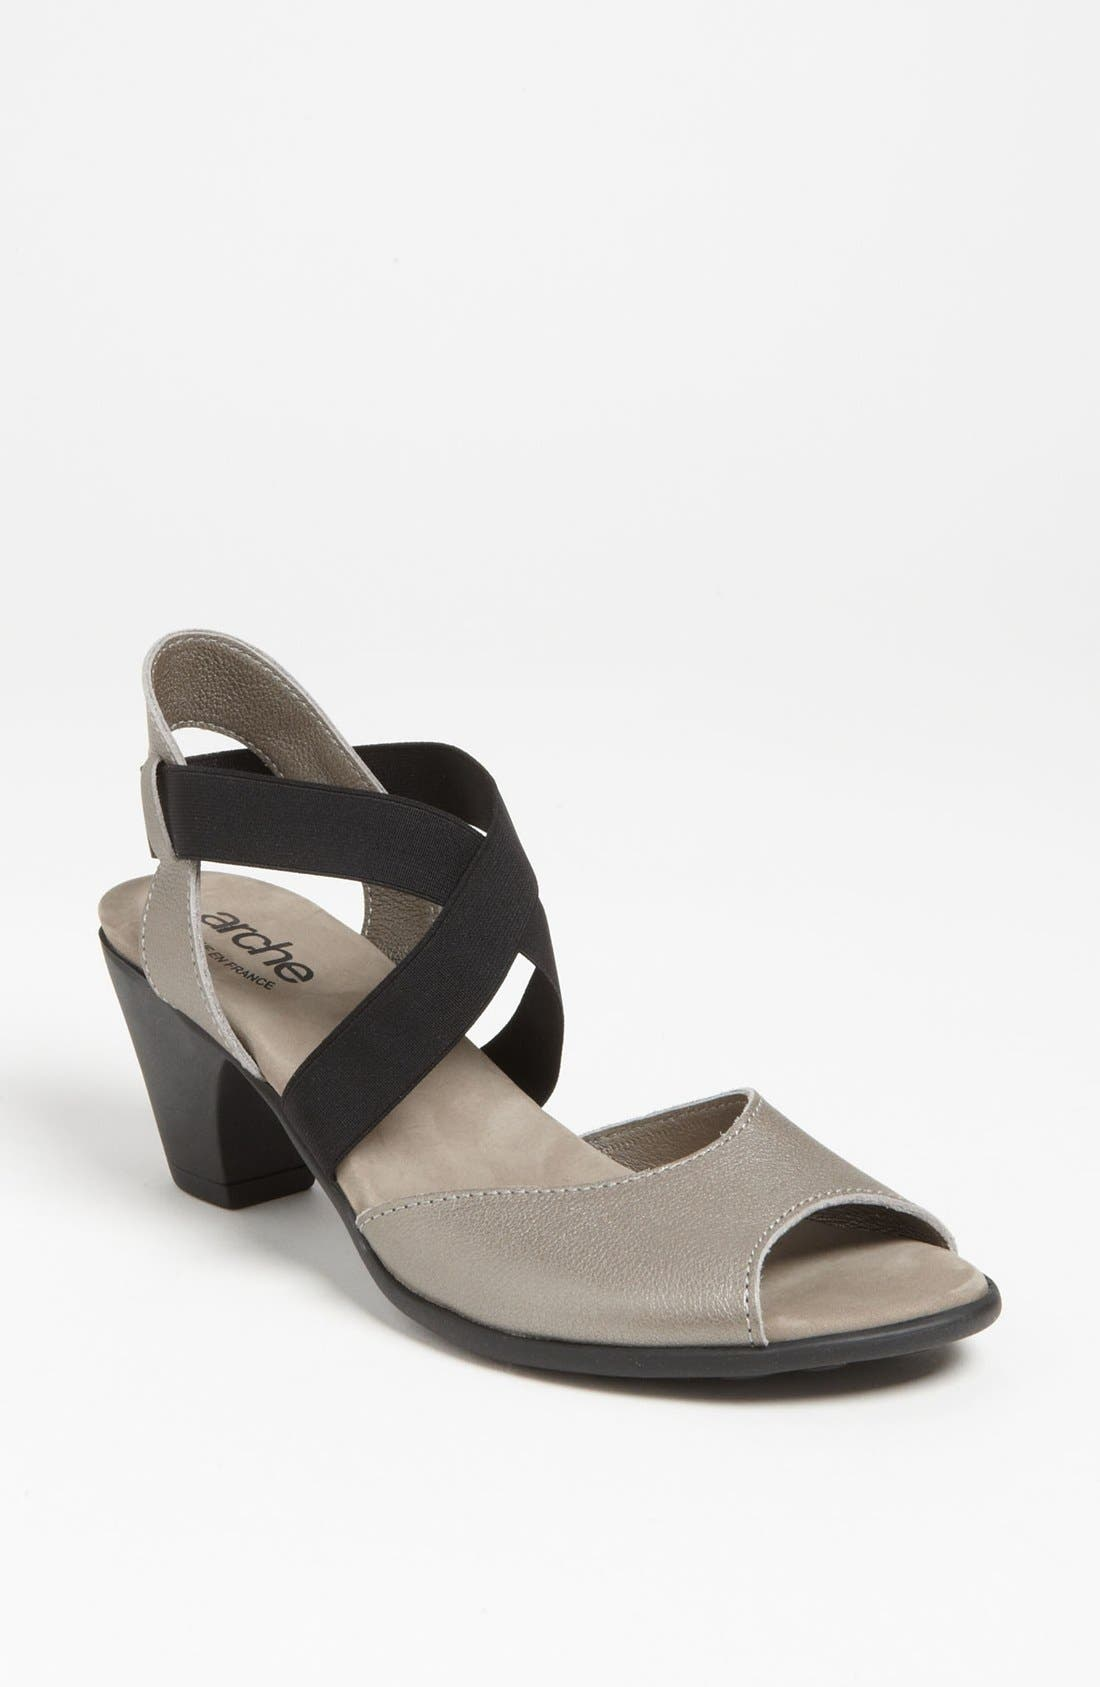 Main Image - Arche 'Mityam' Sandal